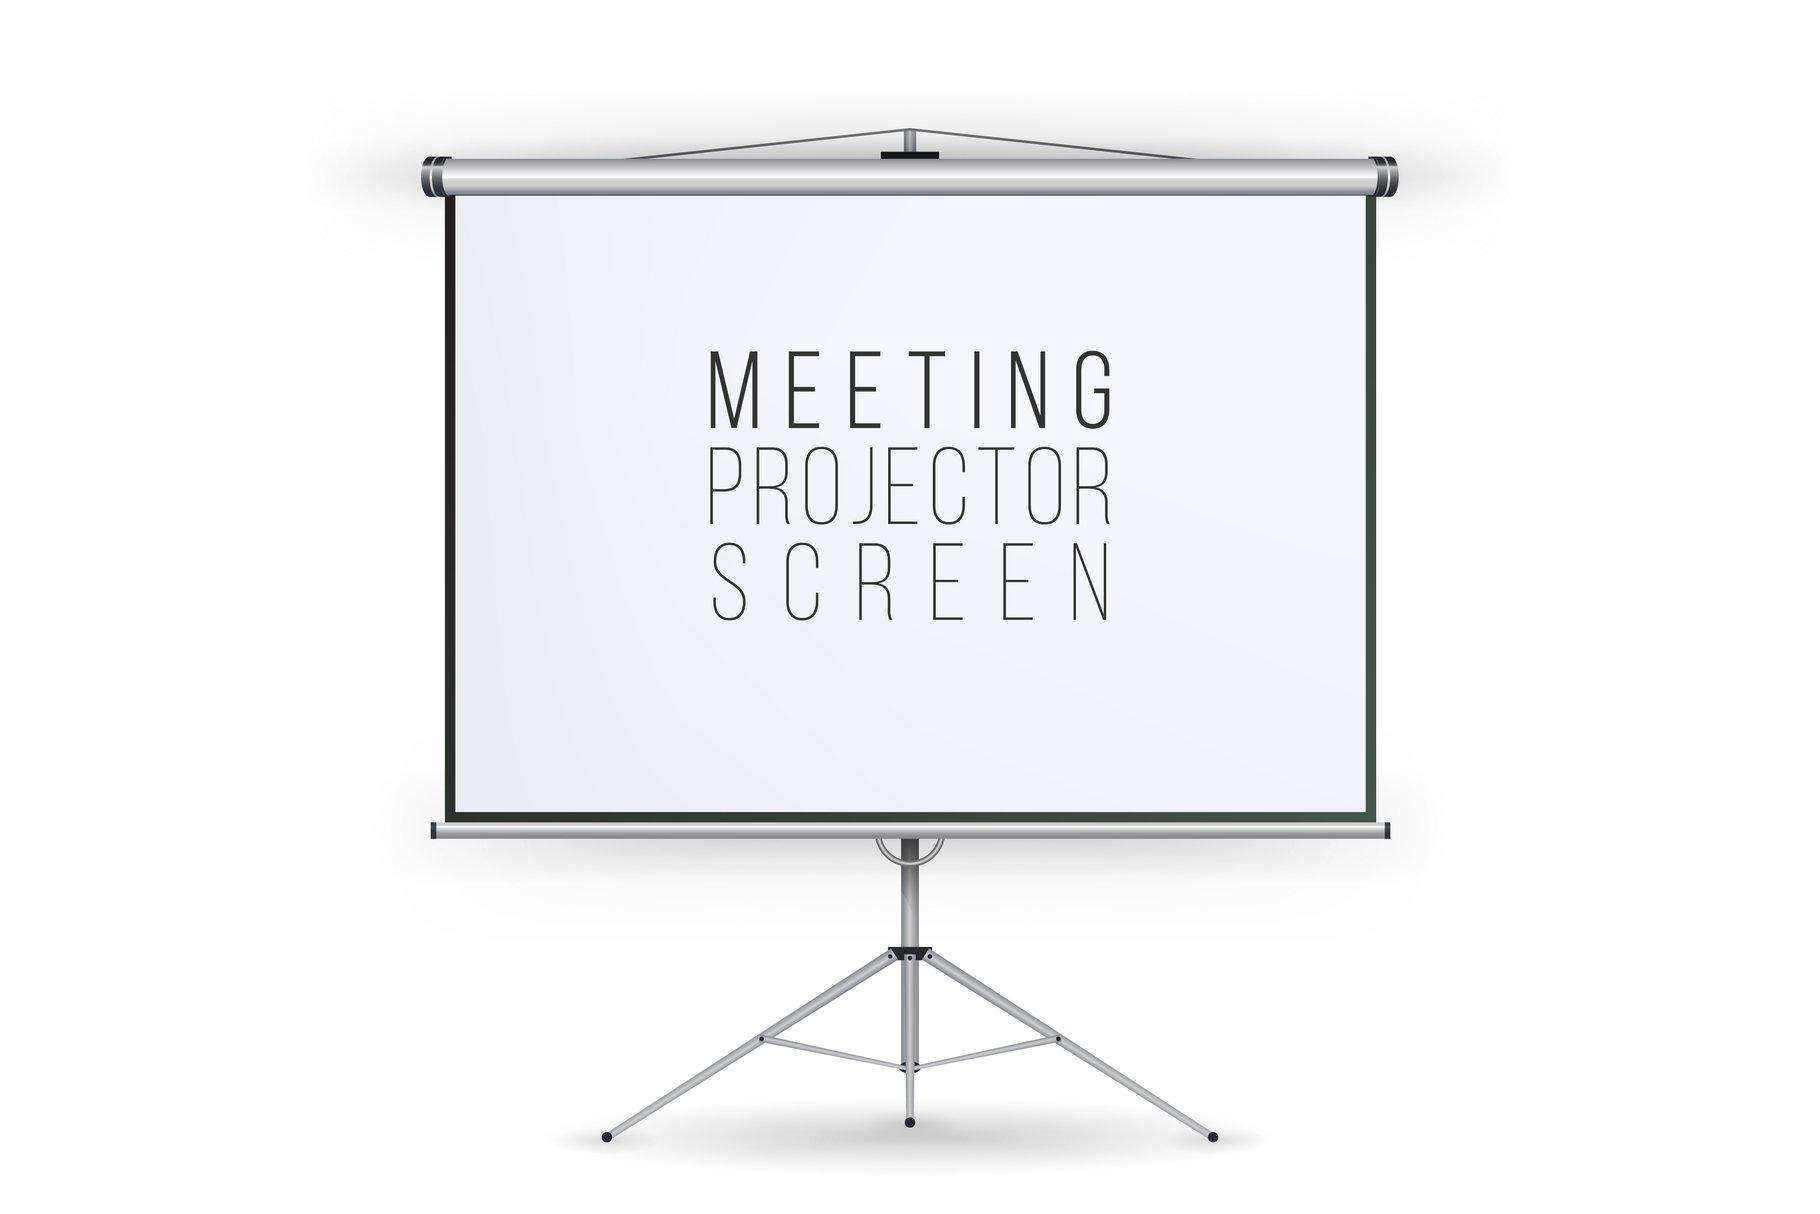 Meeting Projector Screen Vector. example image 1